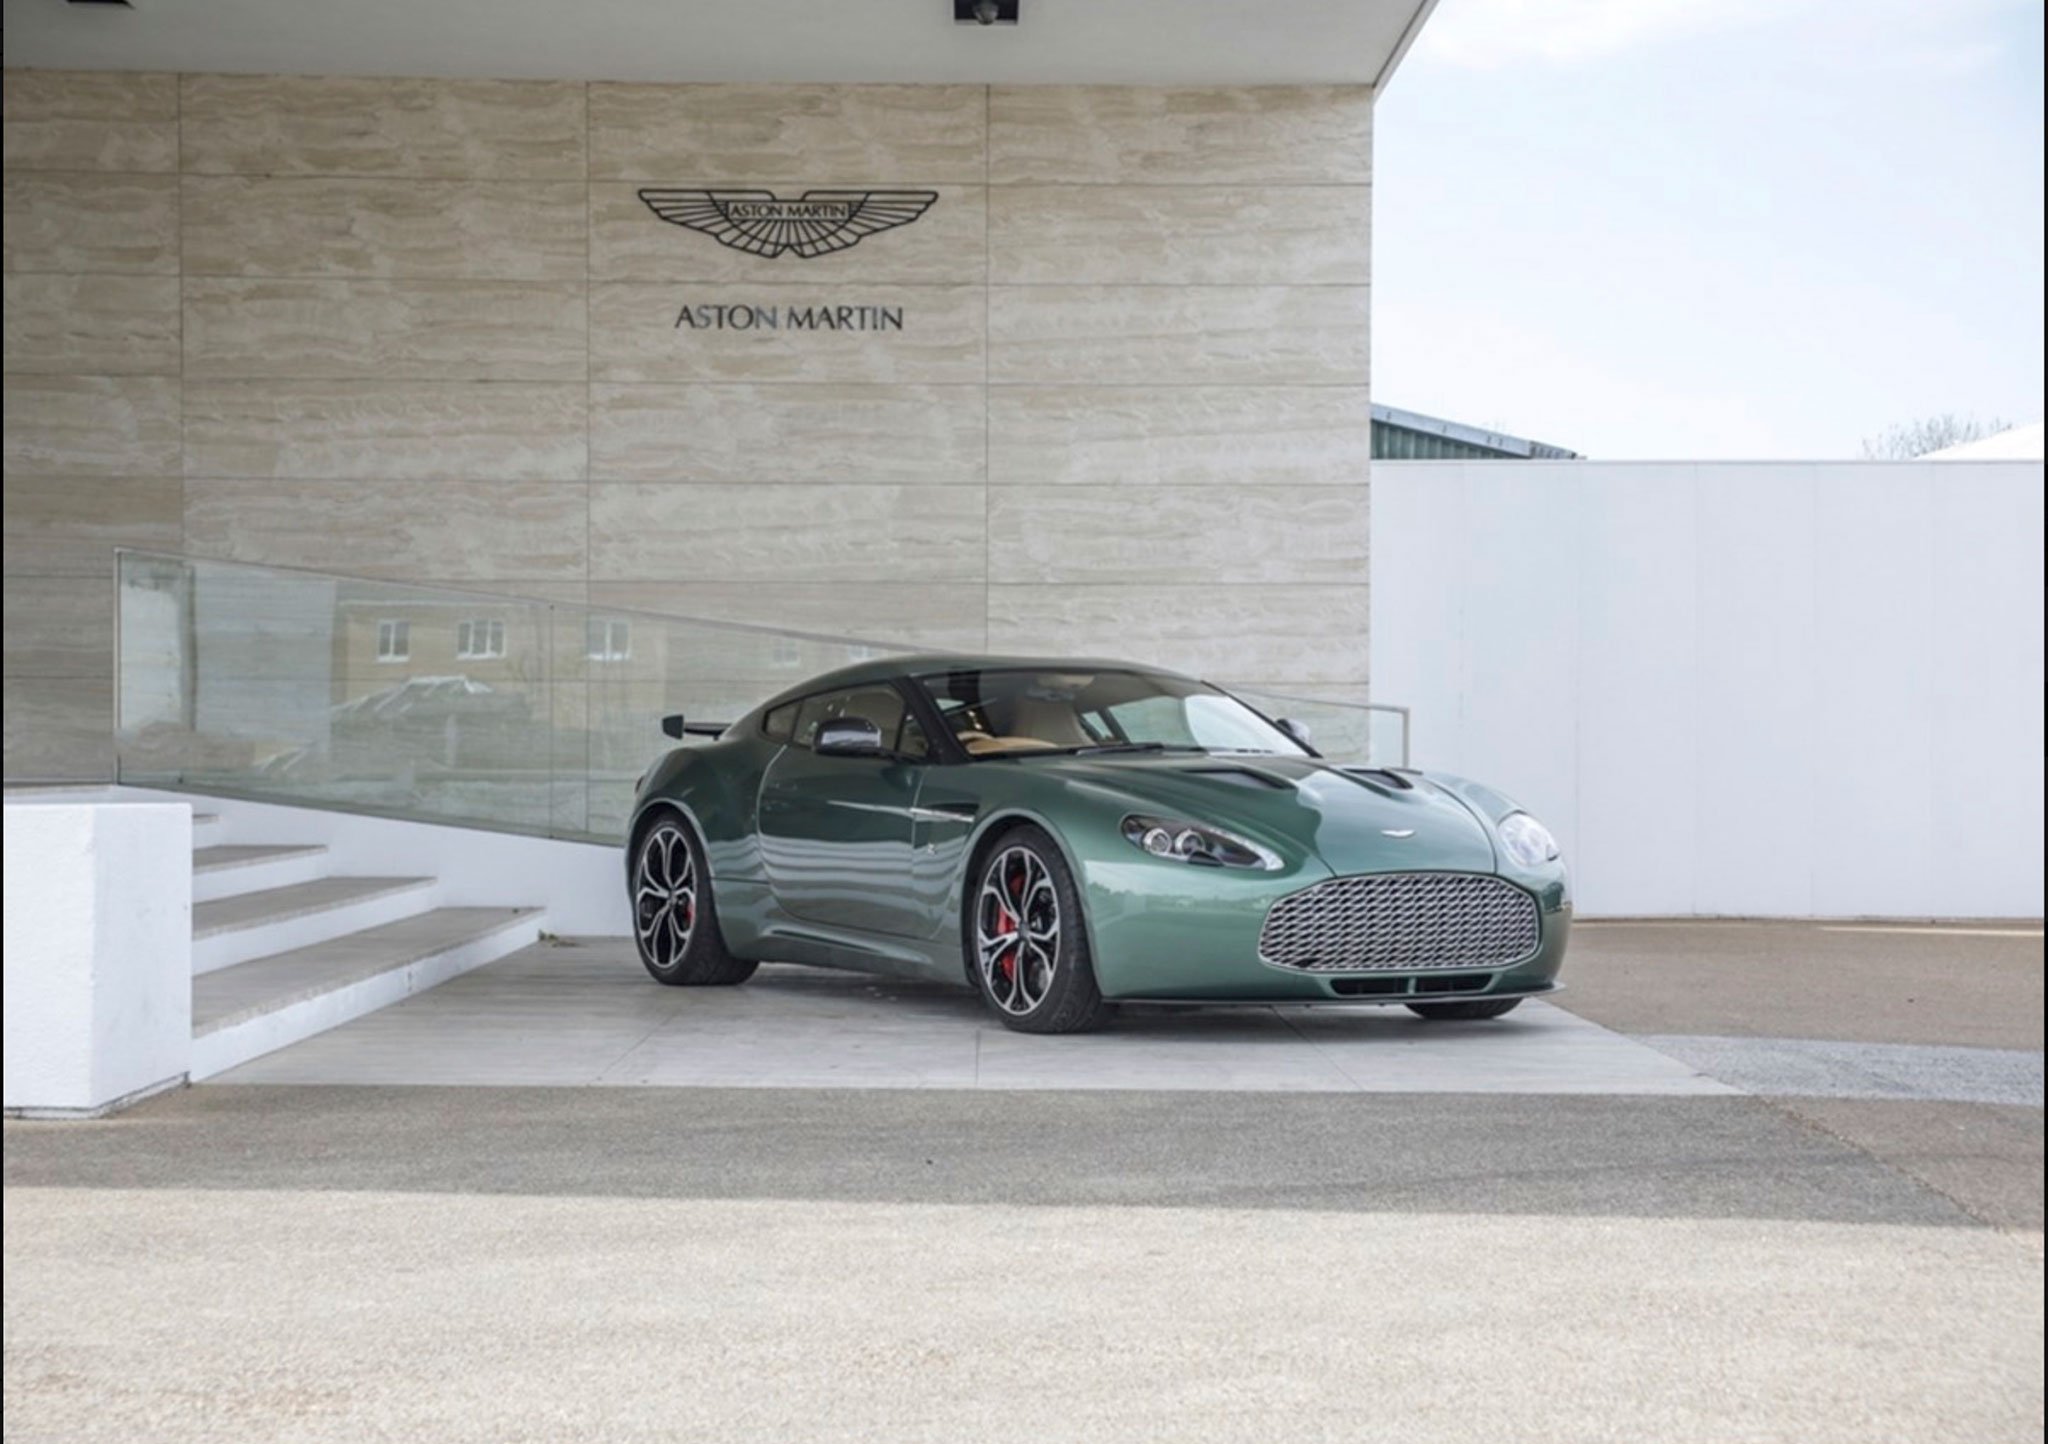 2012 Aston Martin V12 Zagato Prototype Historics Auctioneers Unsold. Marché de la Voiture de Collection.